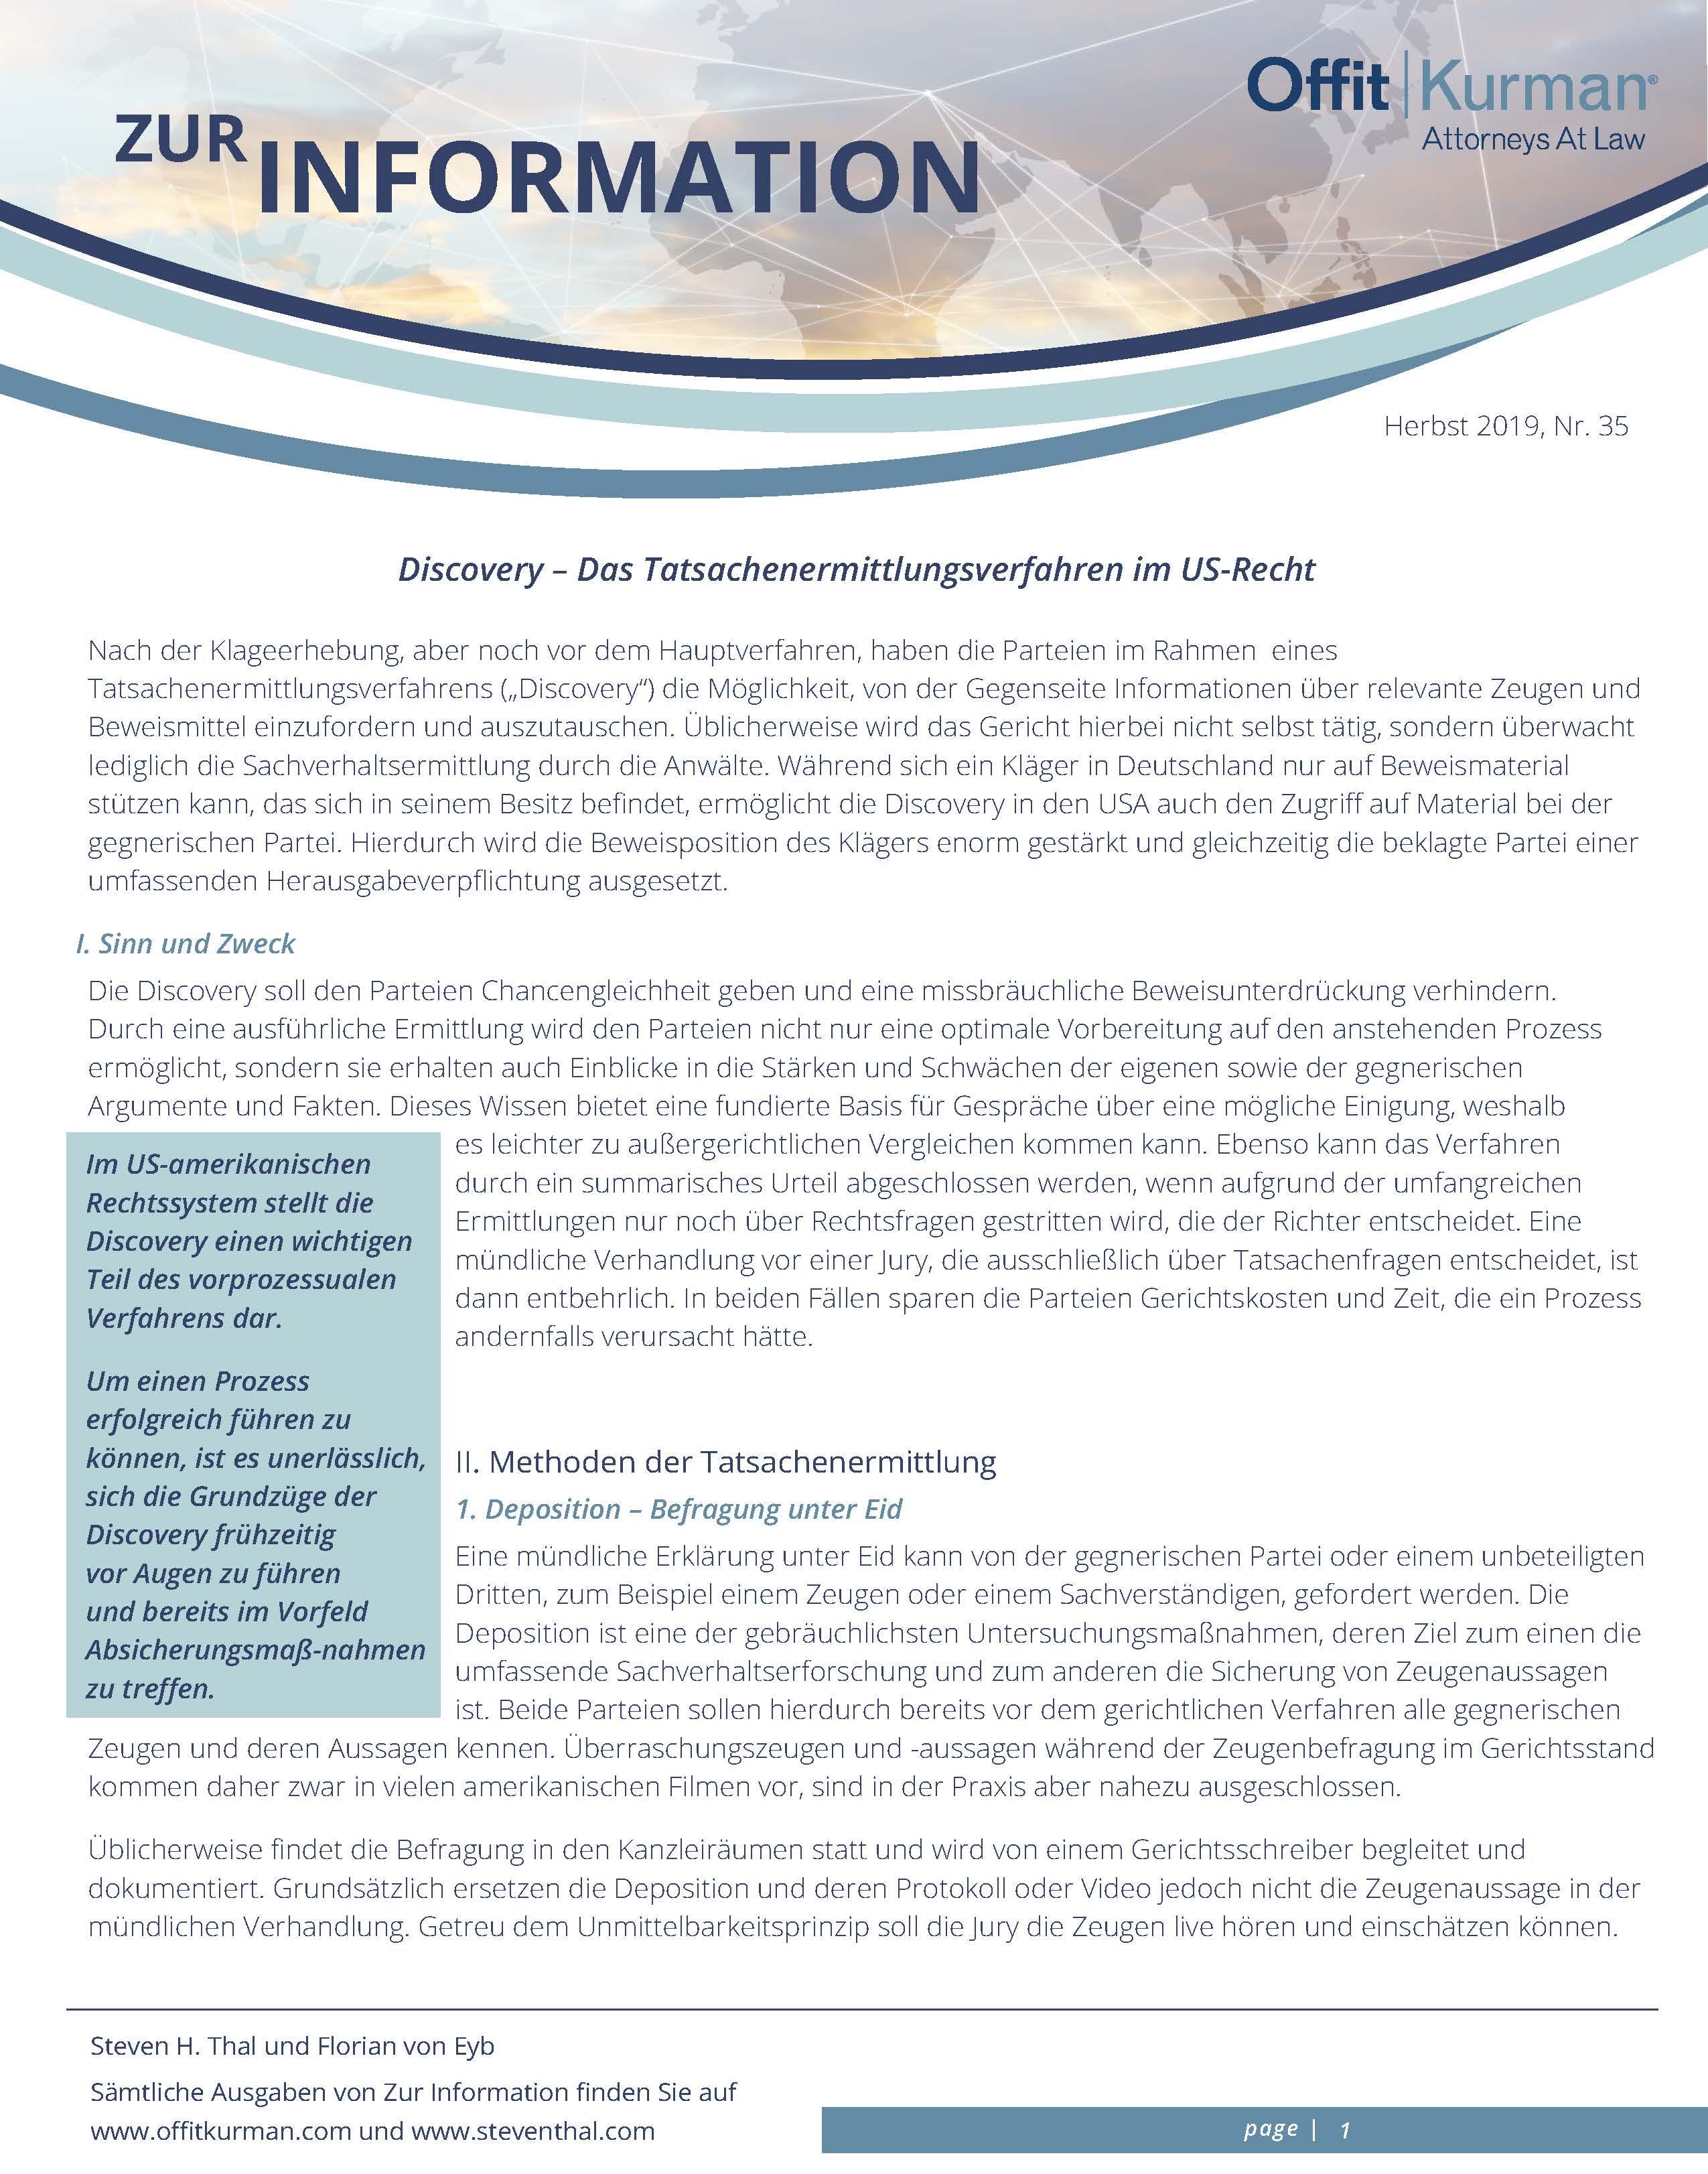 Zur Information - October 2019_Page_1